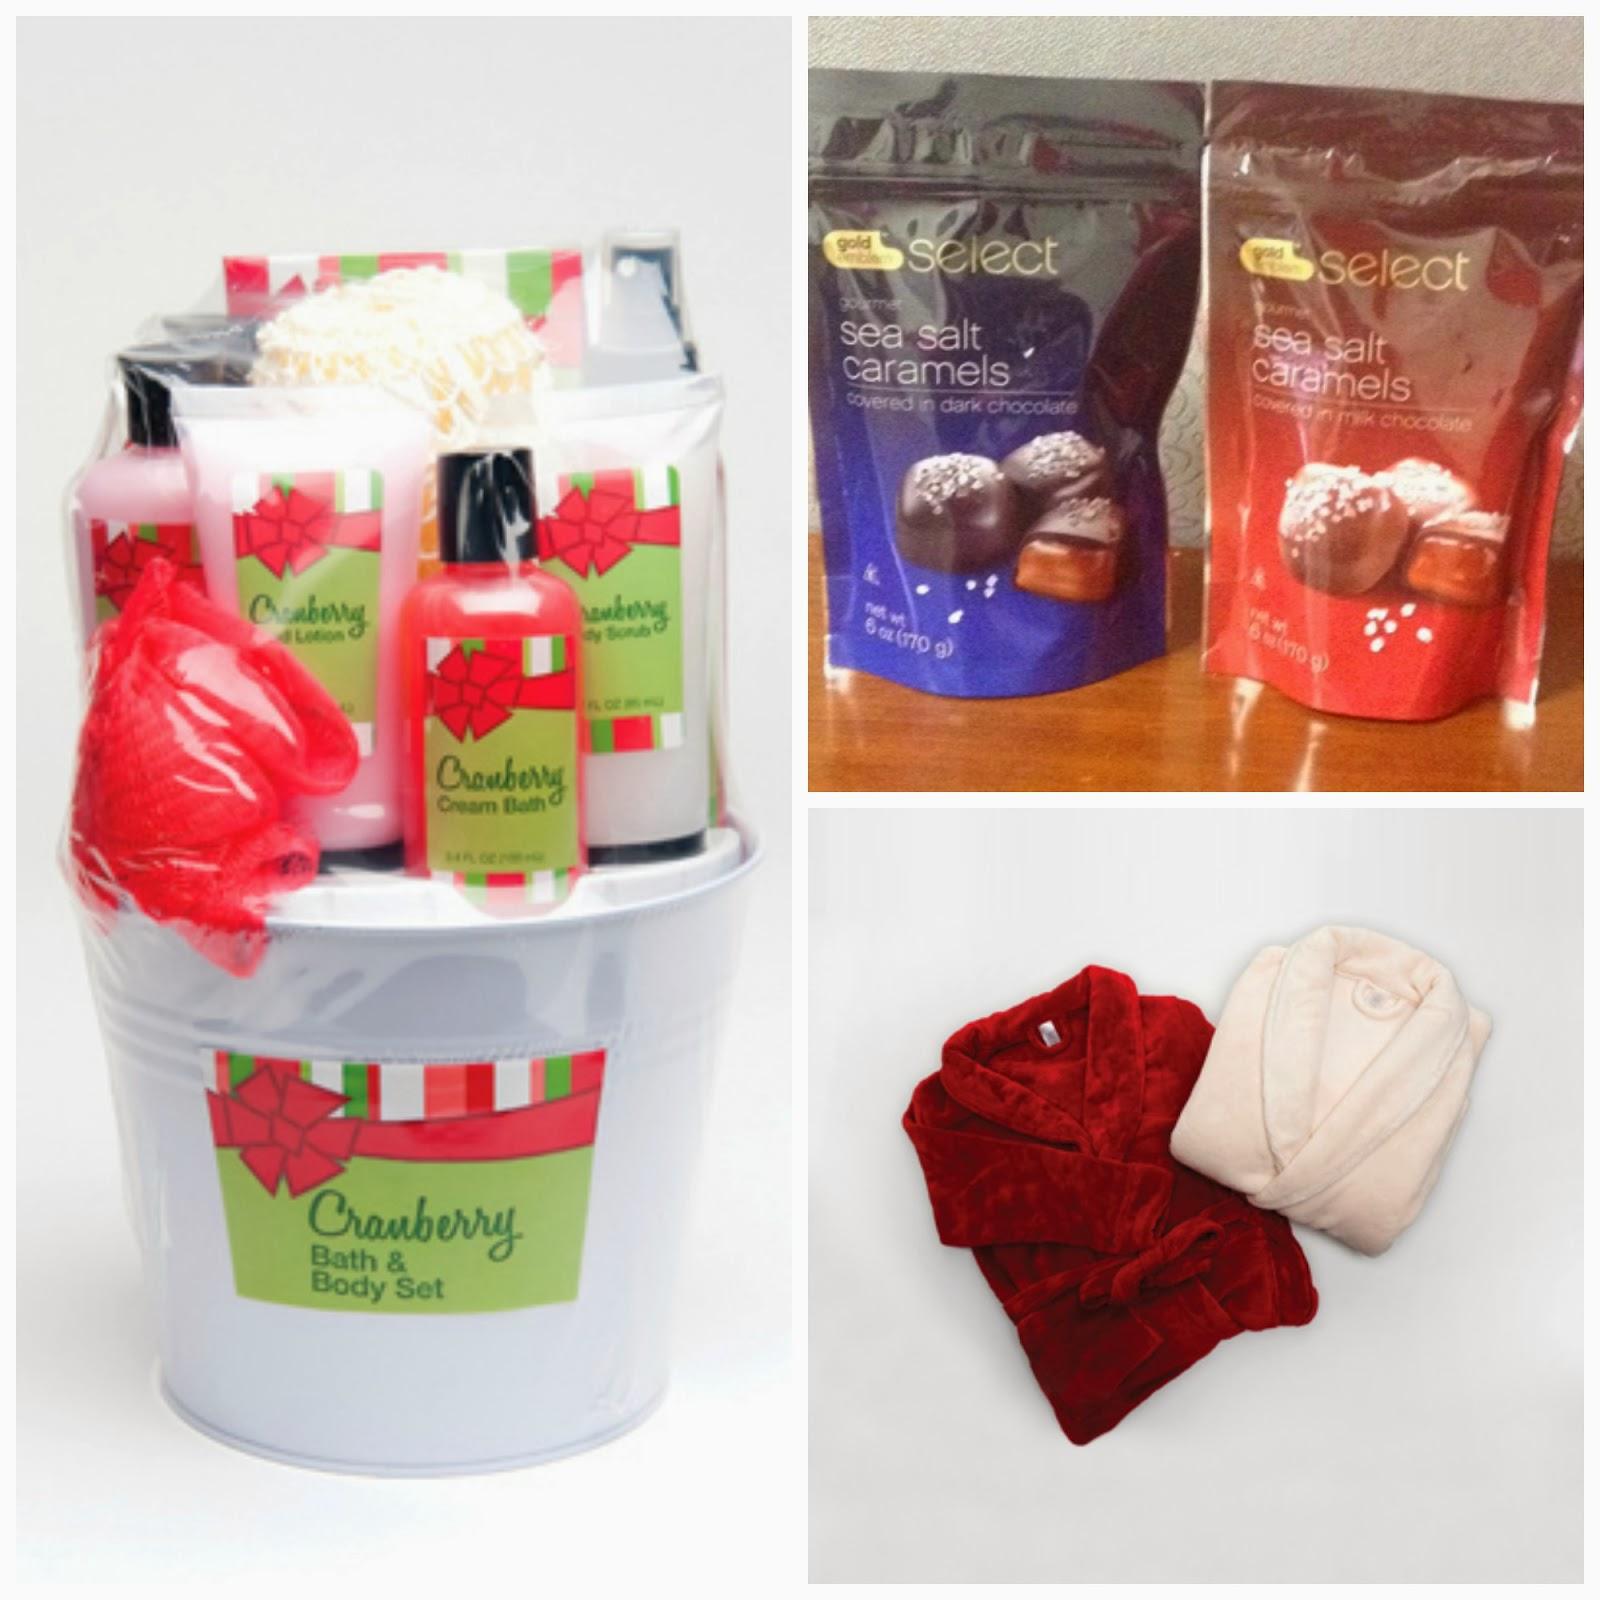 susan u0026 39 s disney family  holiday gift guide  cvs pharmacy gold emblem select line  u2013 a premium